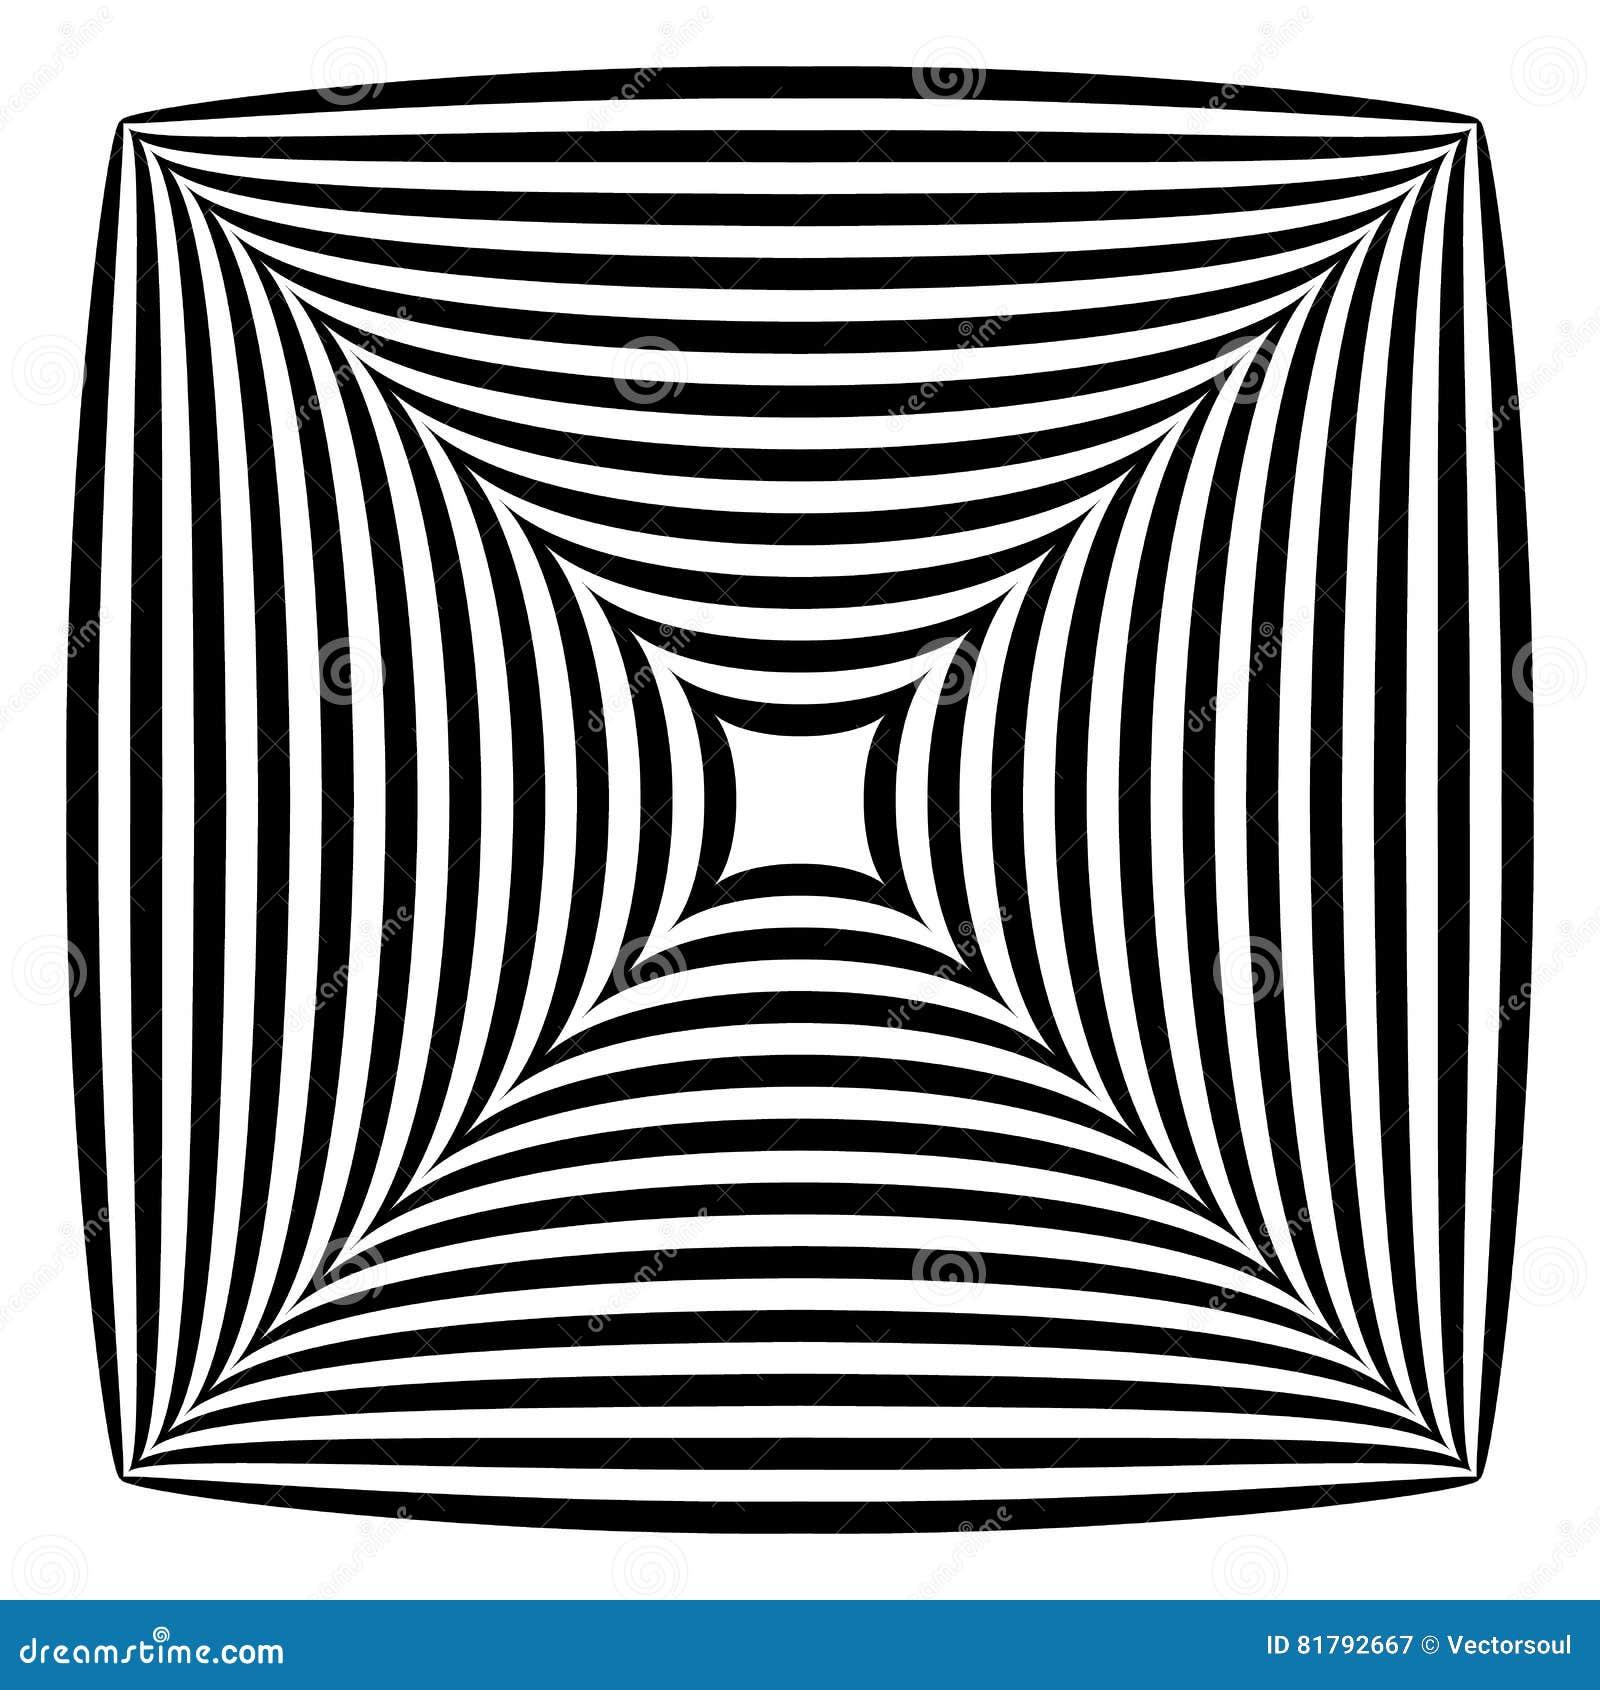 Squarish geometric abstract shape.